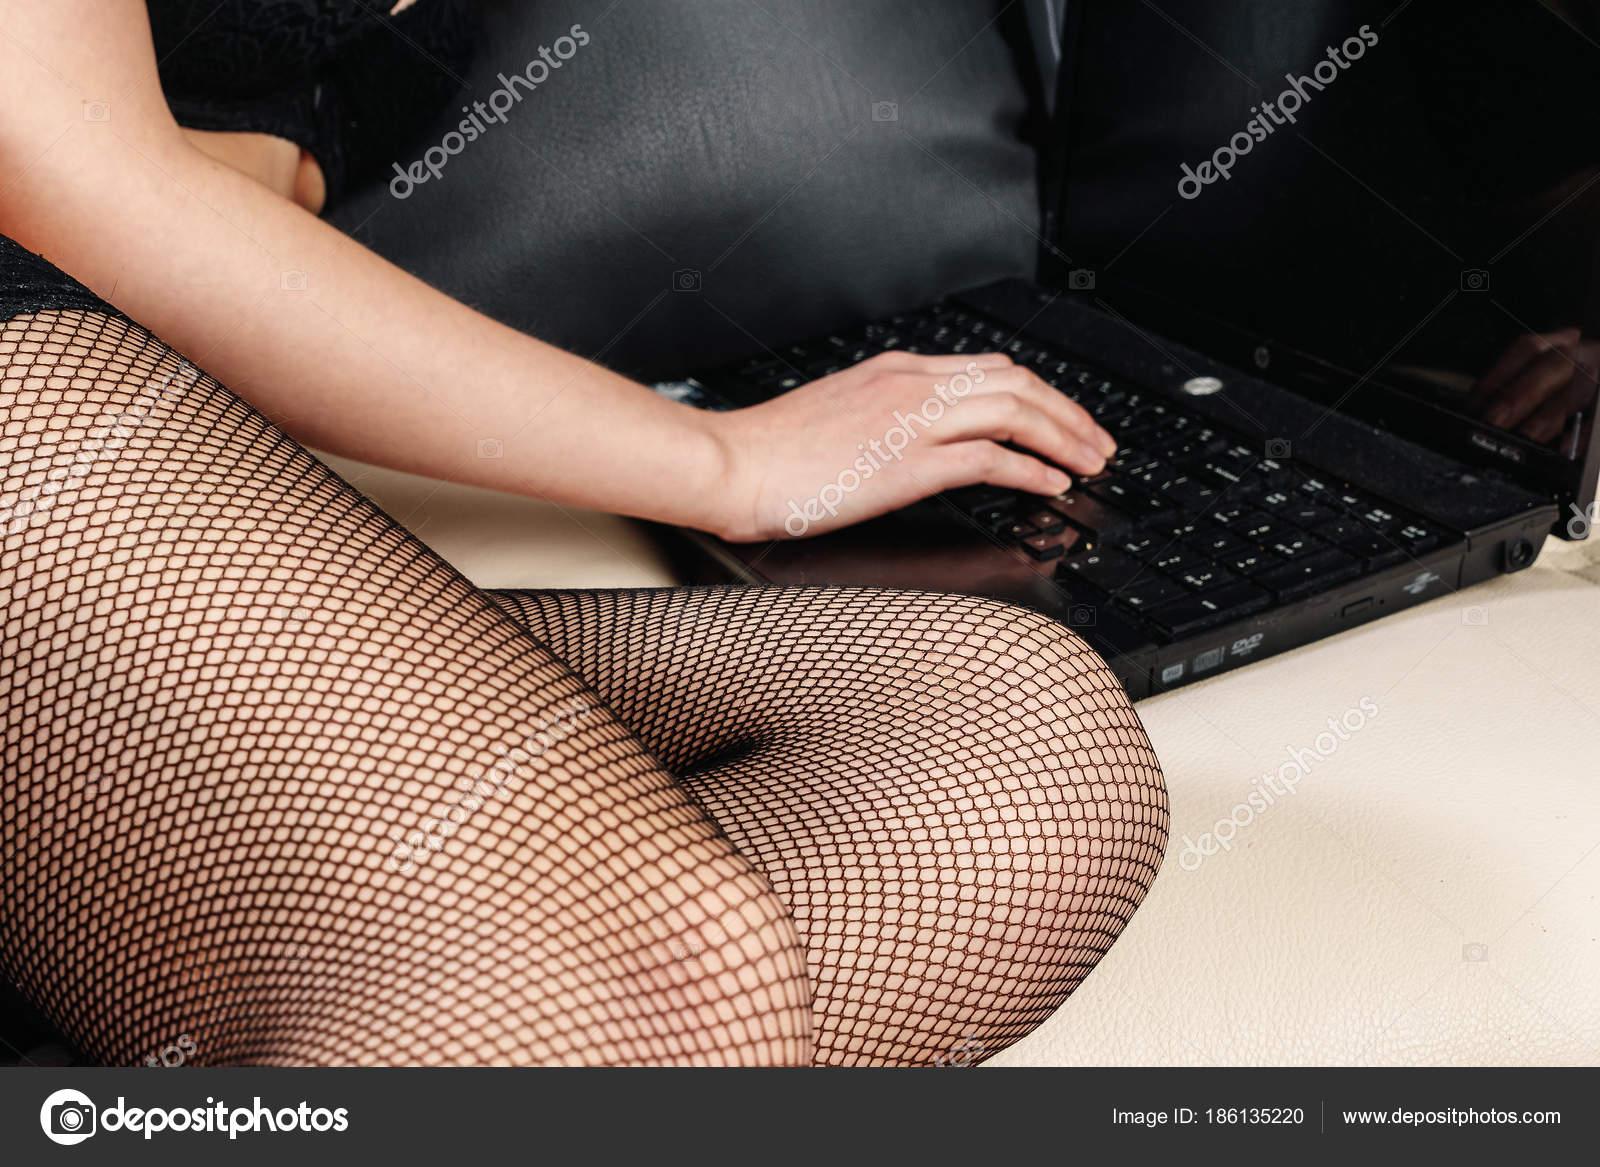 Подруга позирует перед веб